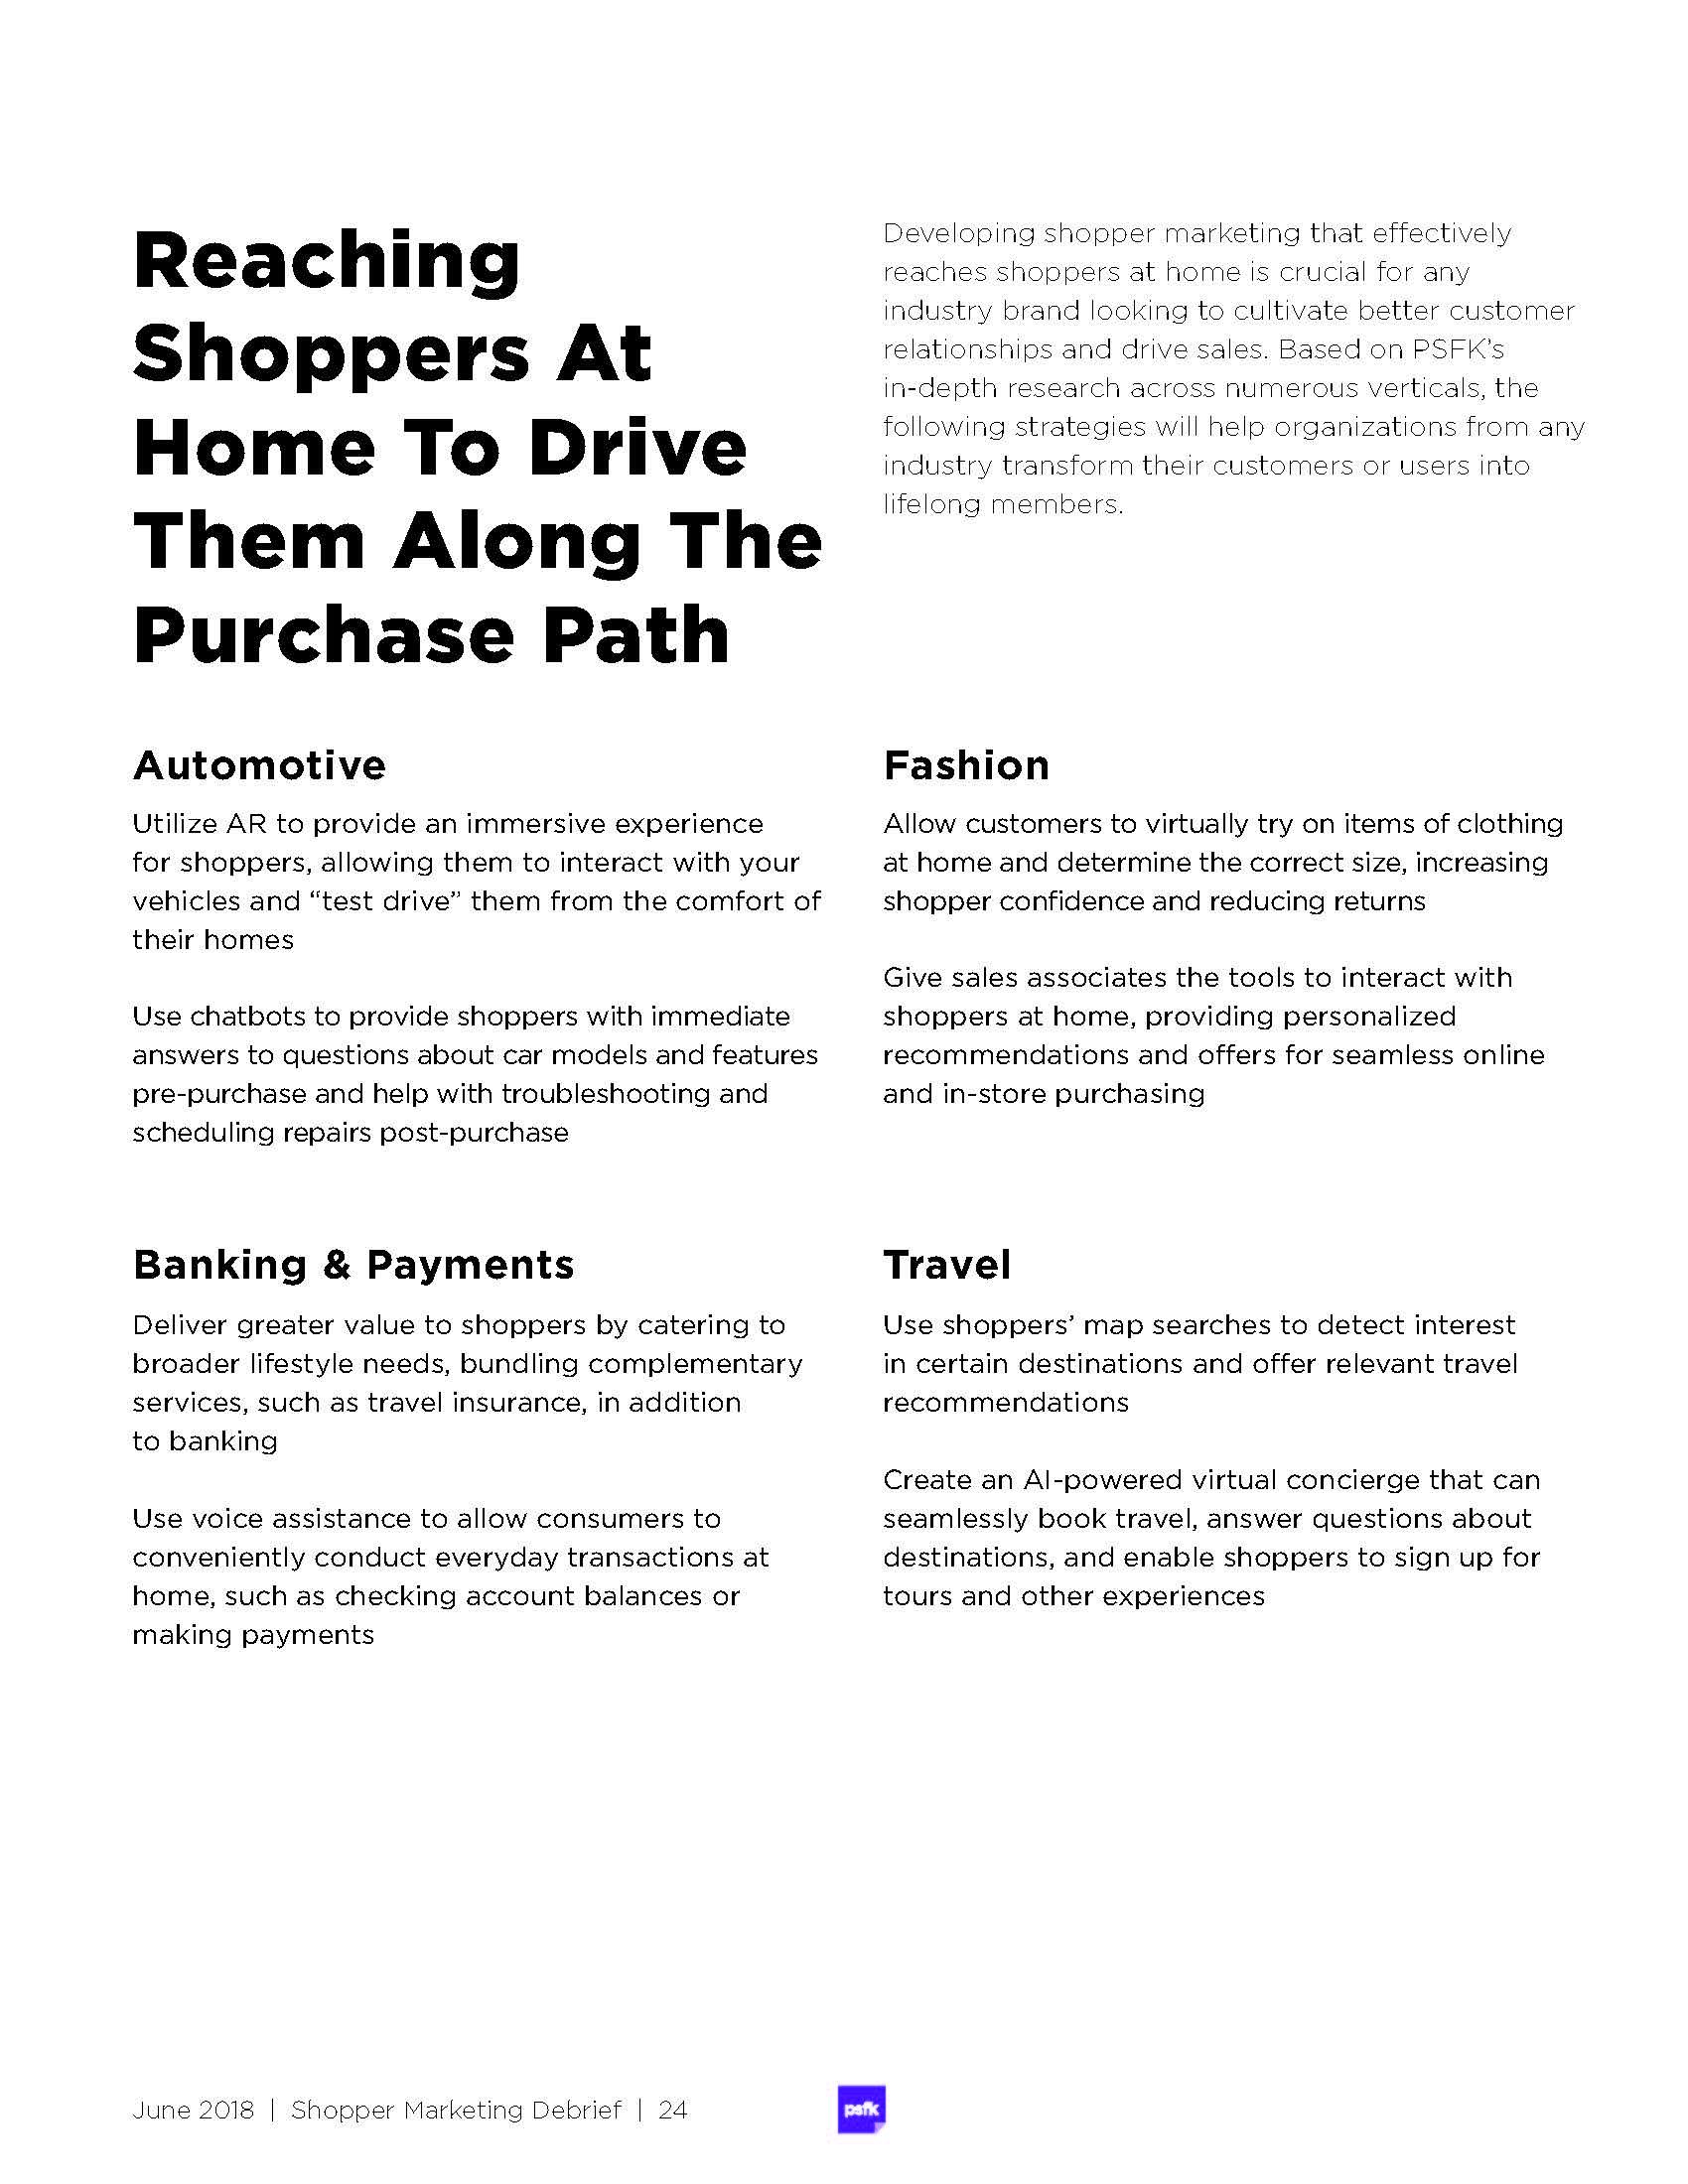 PSFK_AnnabelRuddle_Report_ShopperMarketingDebrief_Page_24.jpg